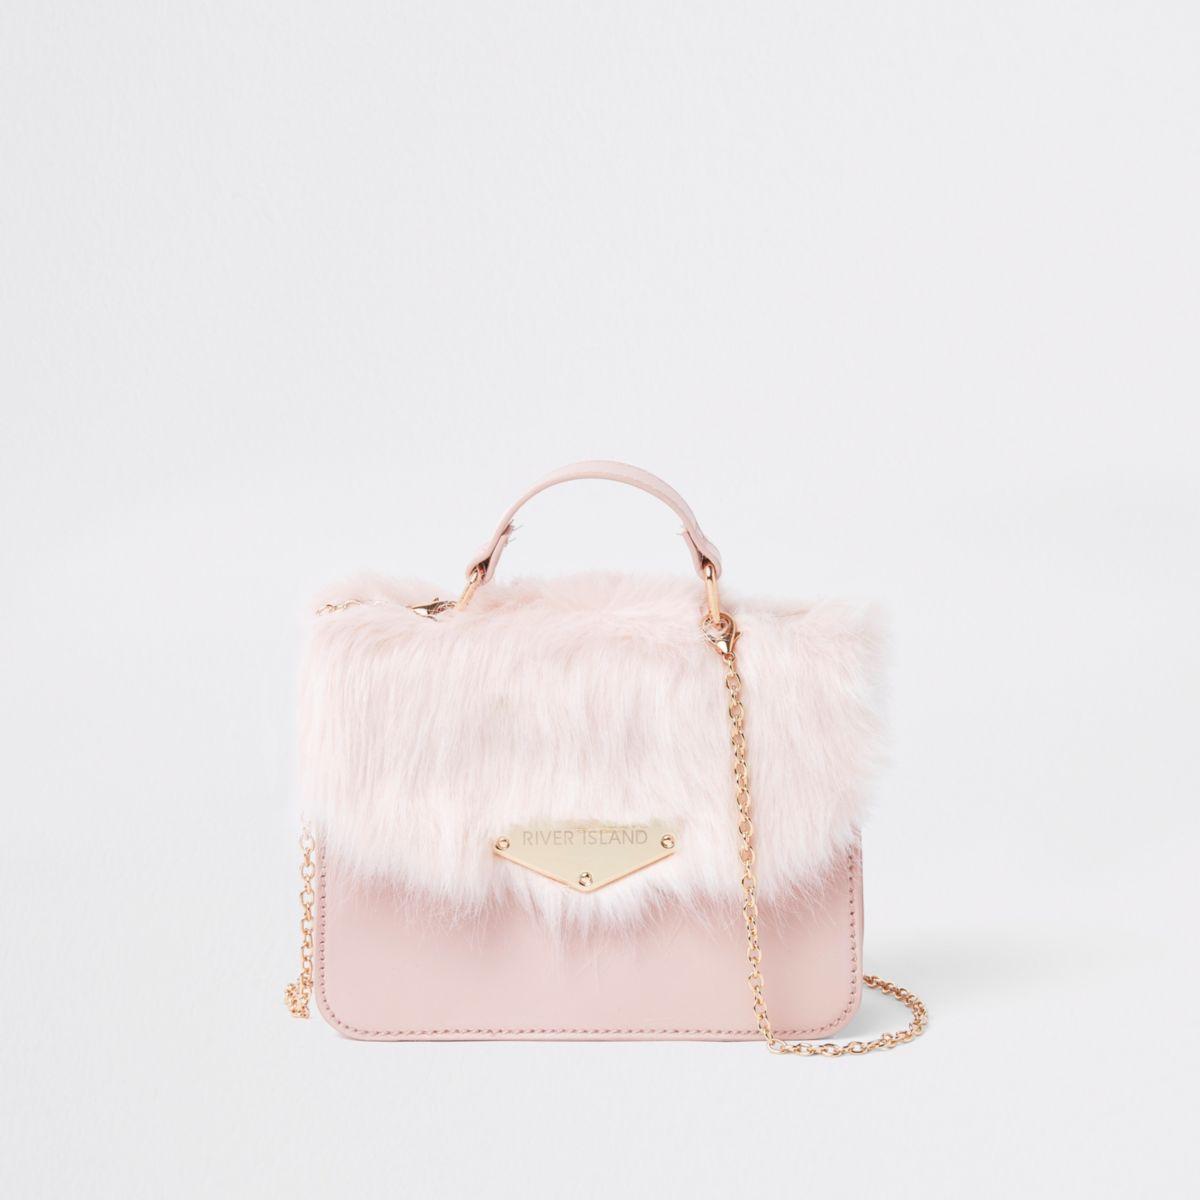 Girls faux fur cross body satchel bag